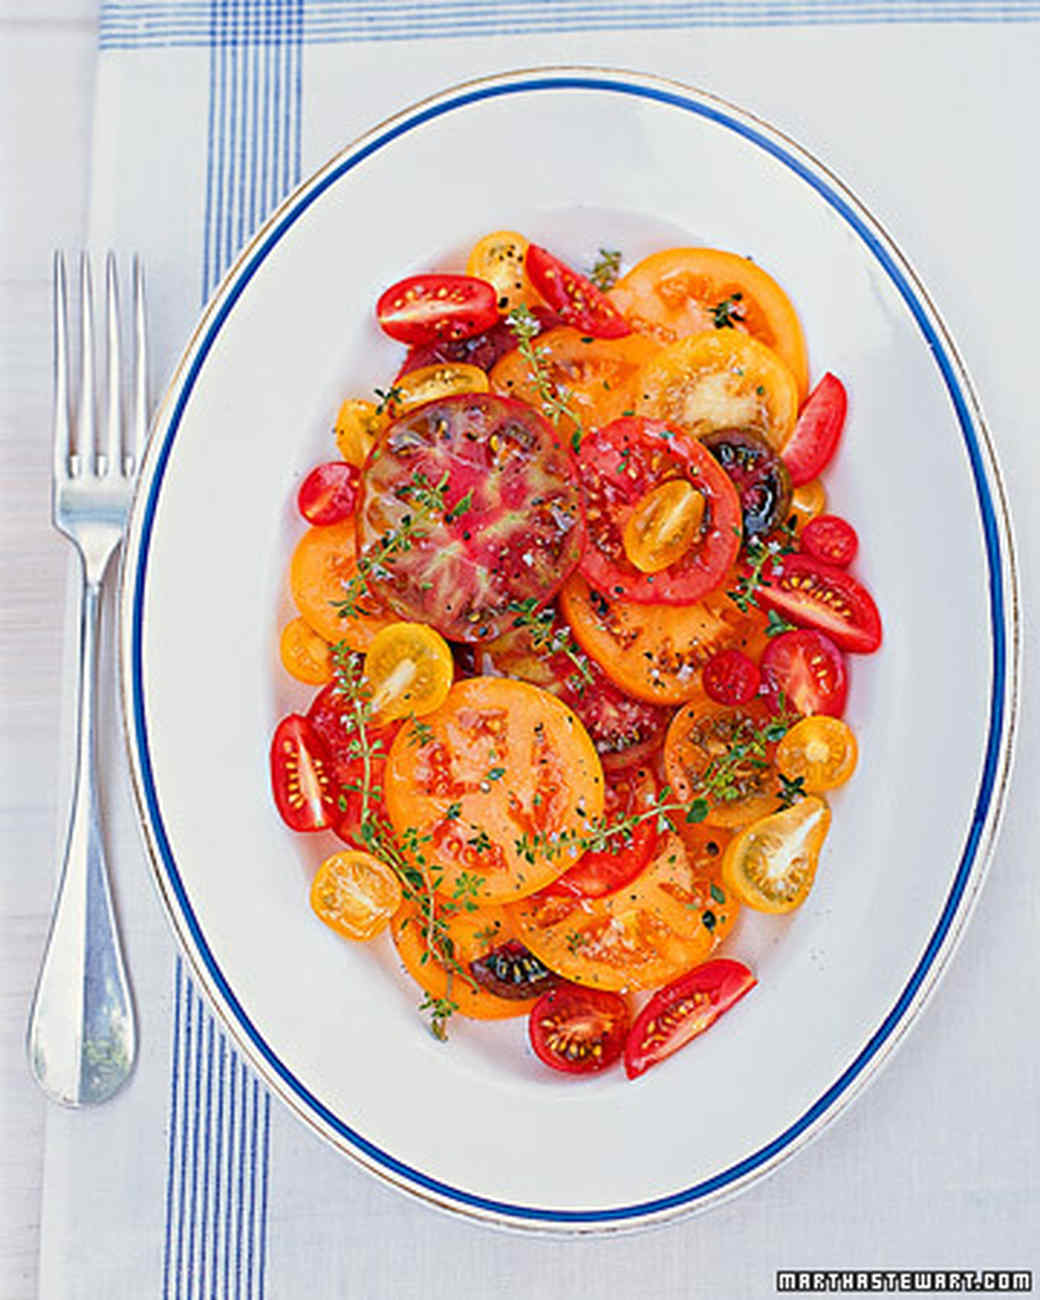 mla102480_0807_tomatoes.jpg